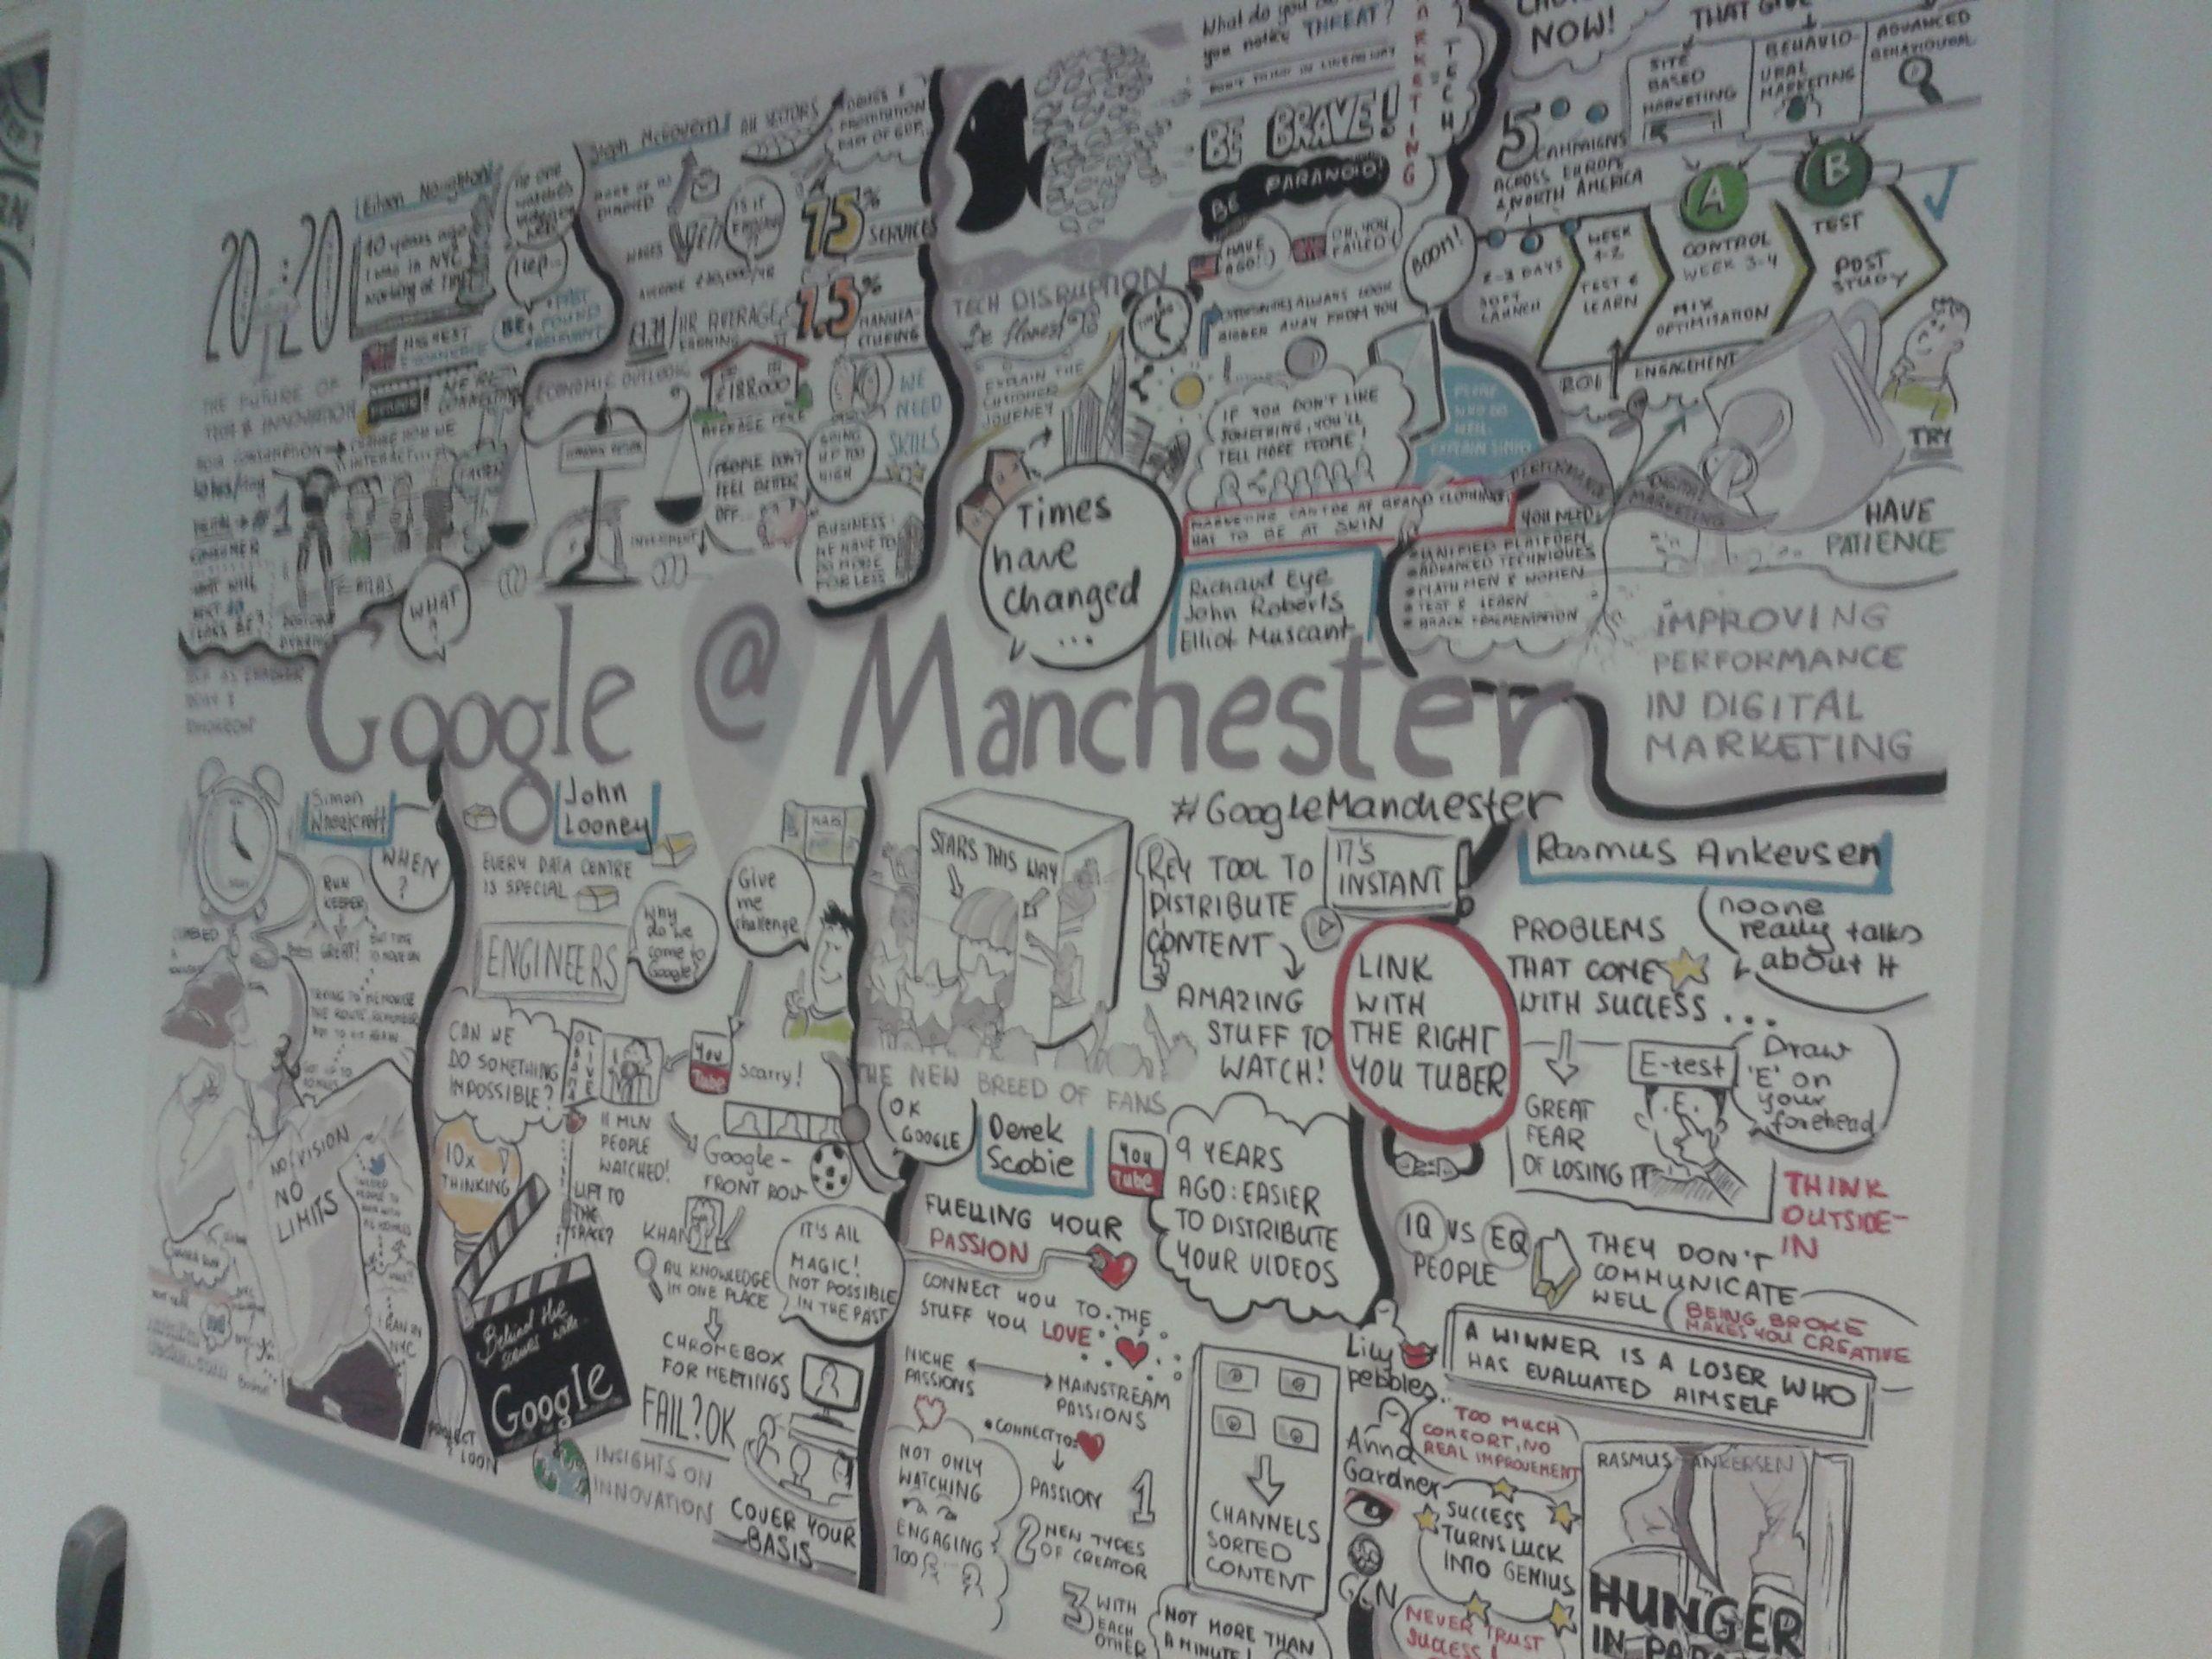 Google Manchester